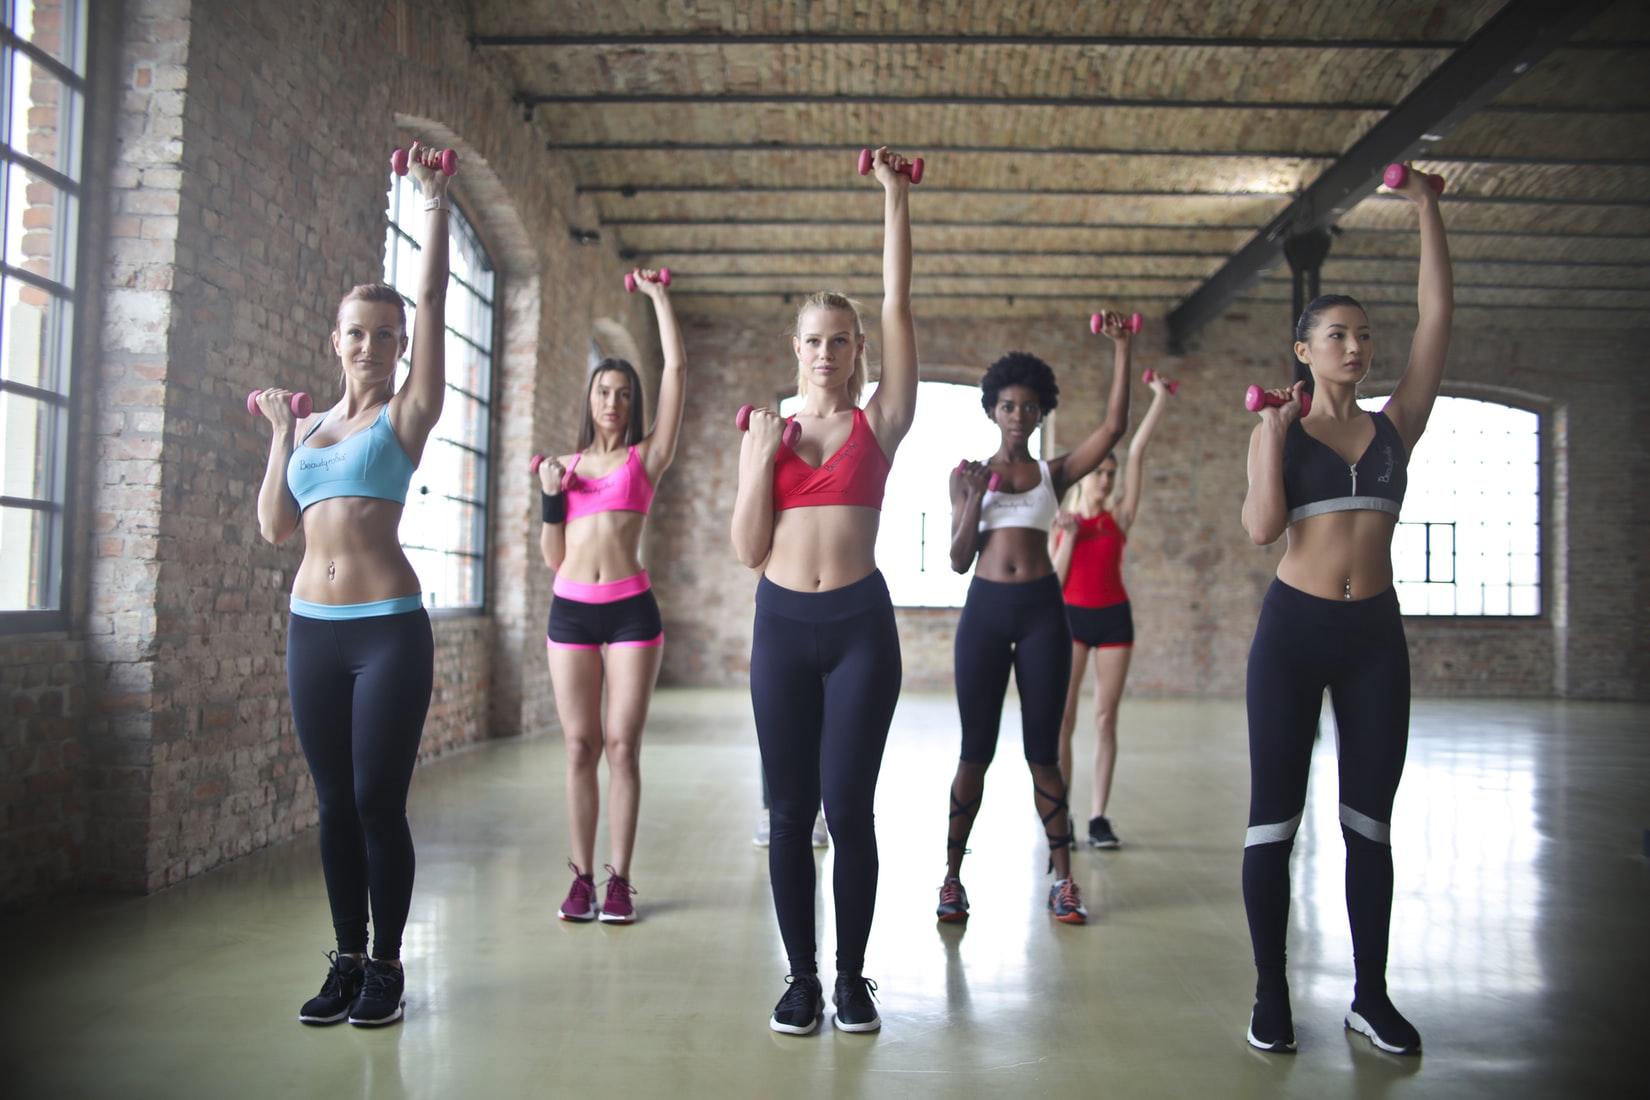 Myth 2: Lifting weights make women bulky.